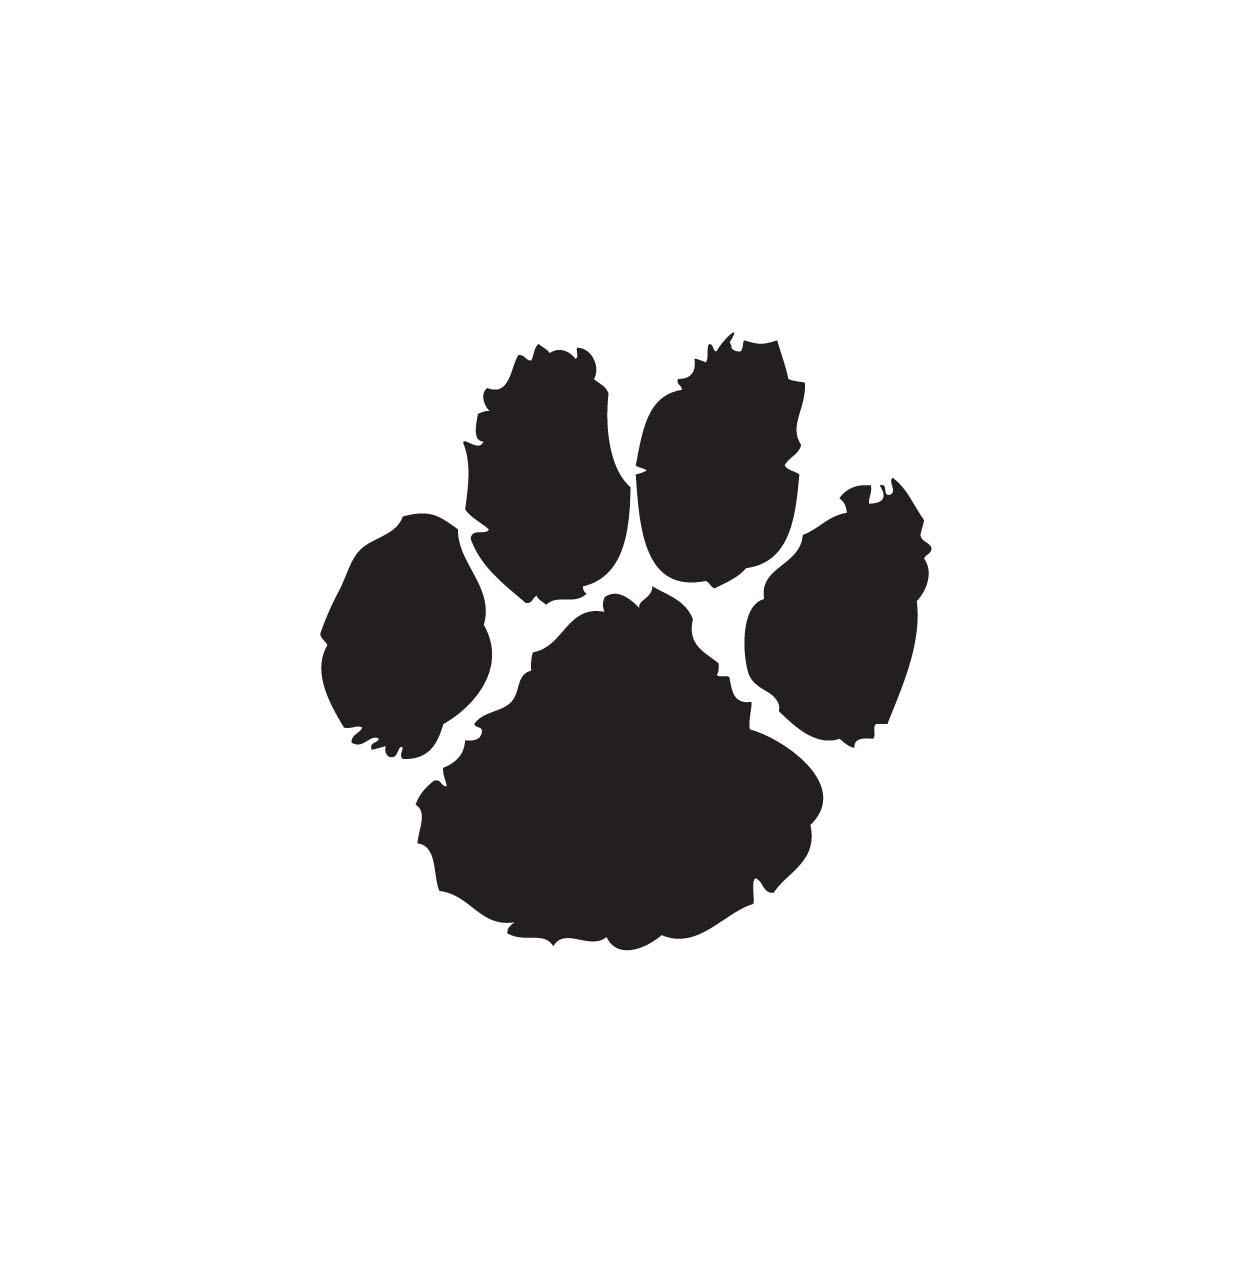 Free Clip Art Dog Paw Print - ClipArt Best